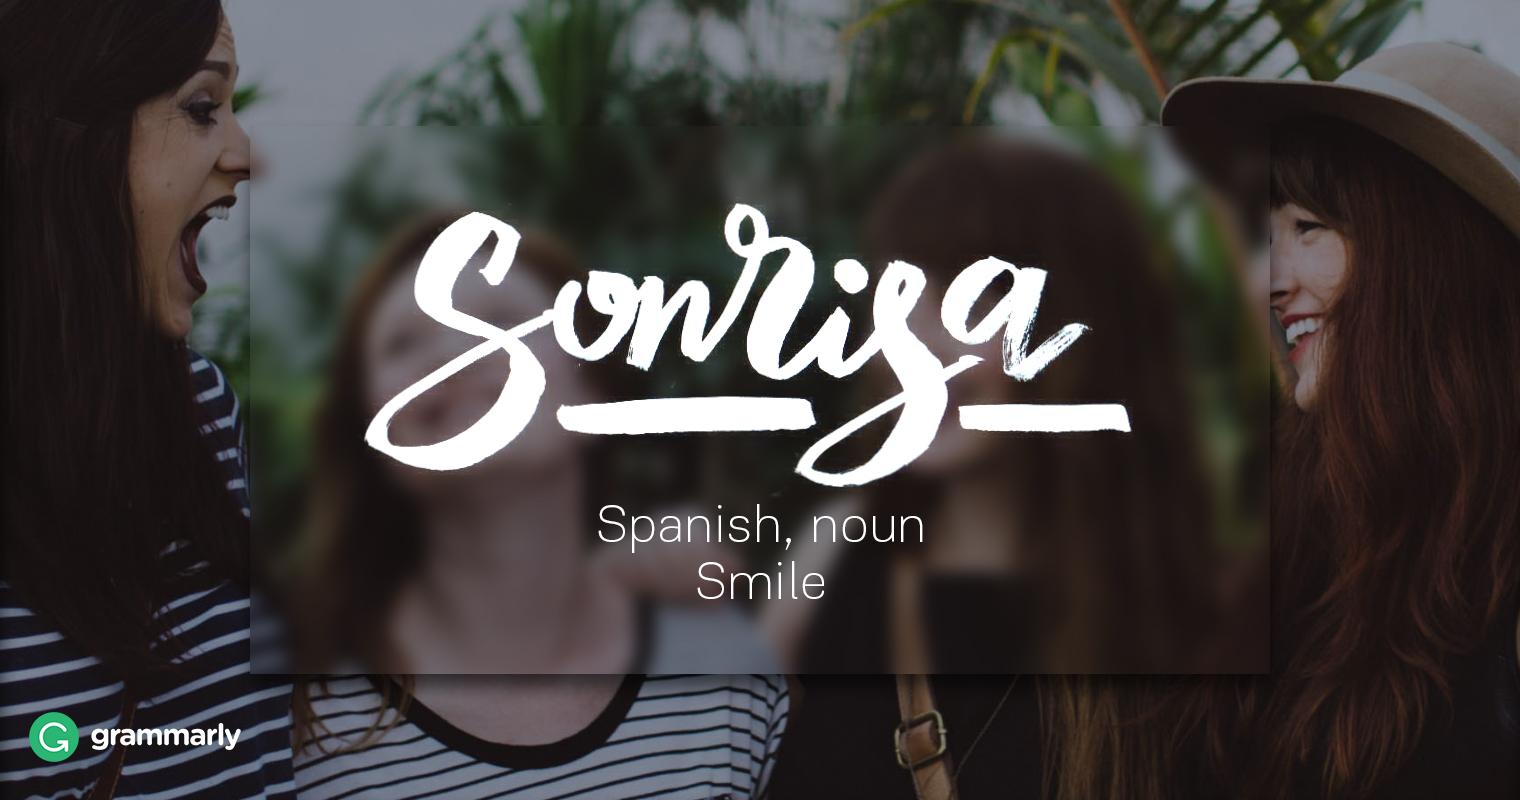 Sonrisa Definition